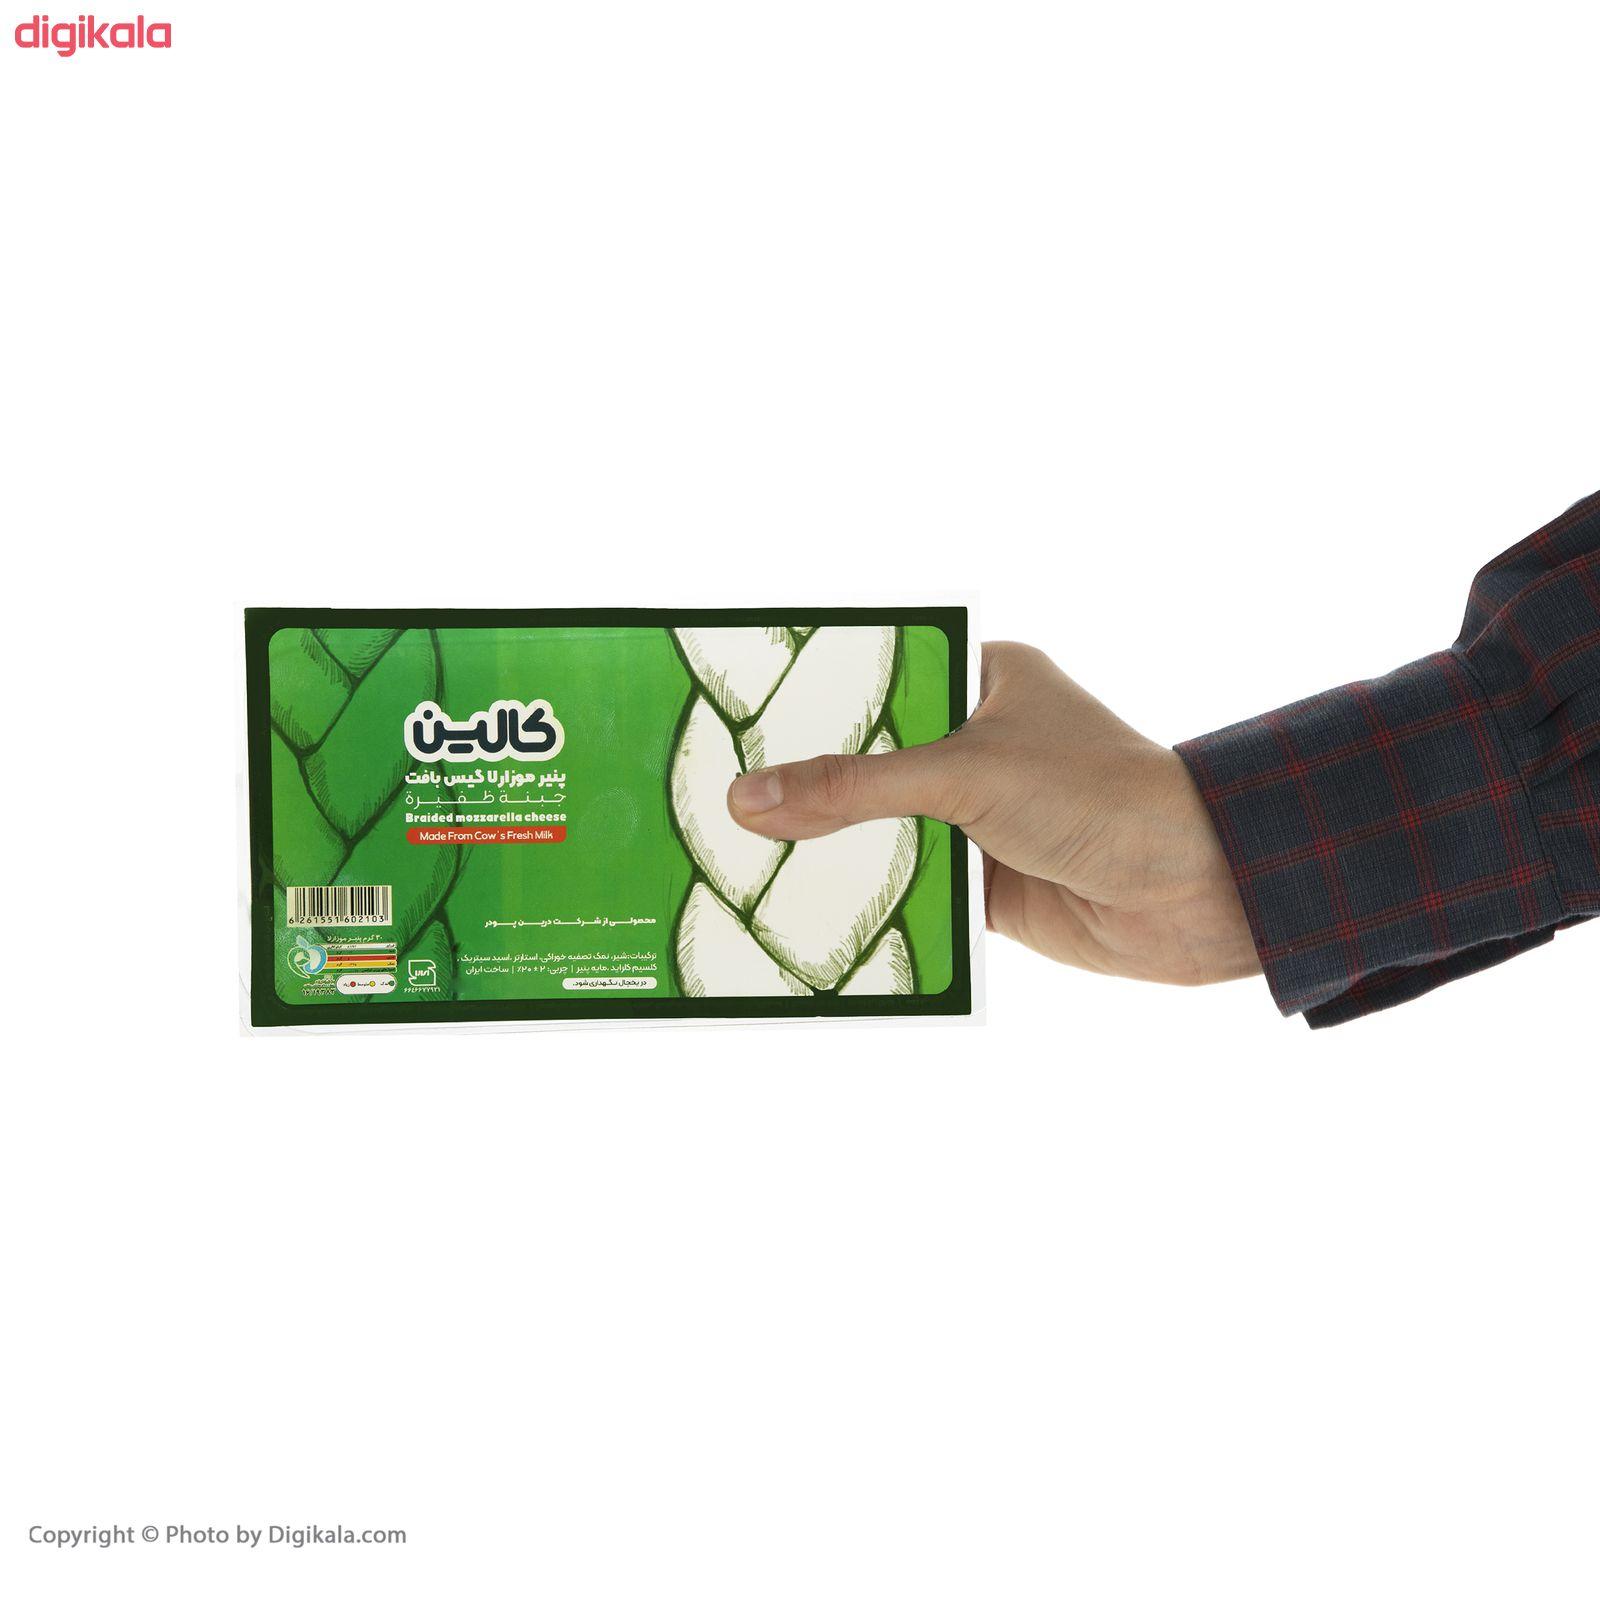 پنیر موزارلا گیس بافت کالین - 200 گرم main 1 6